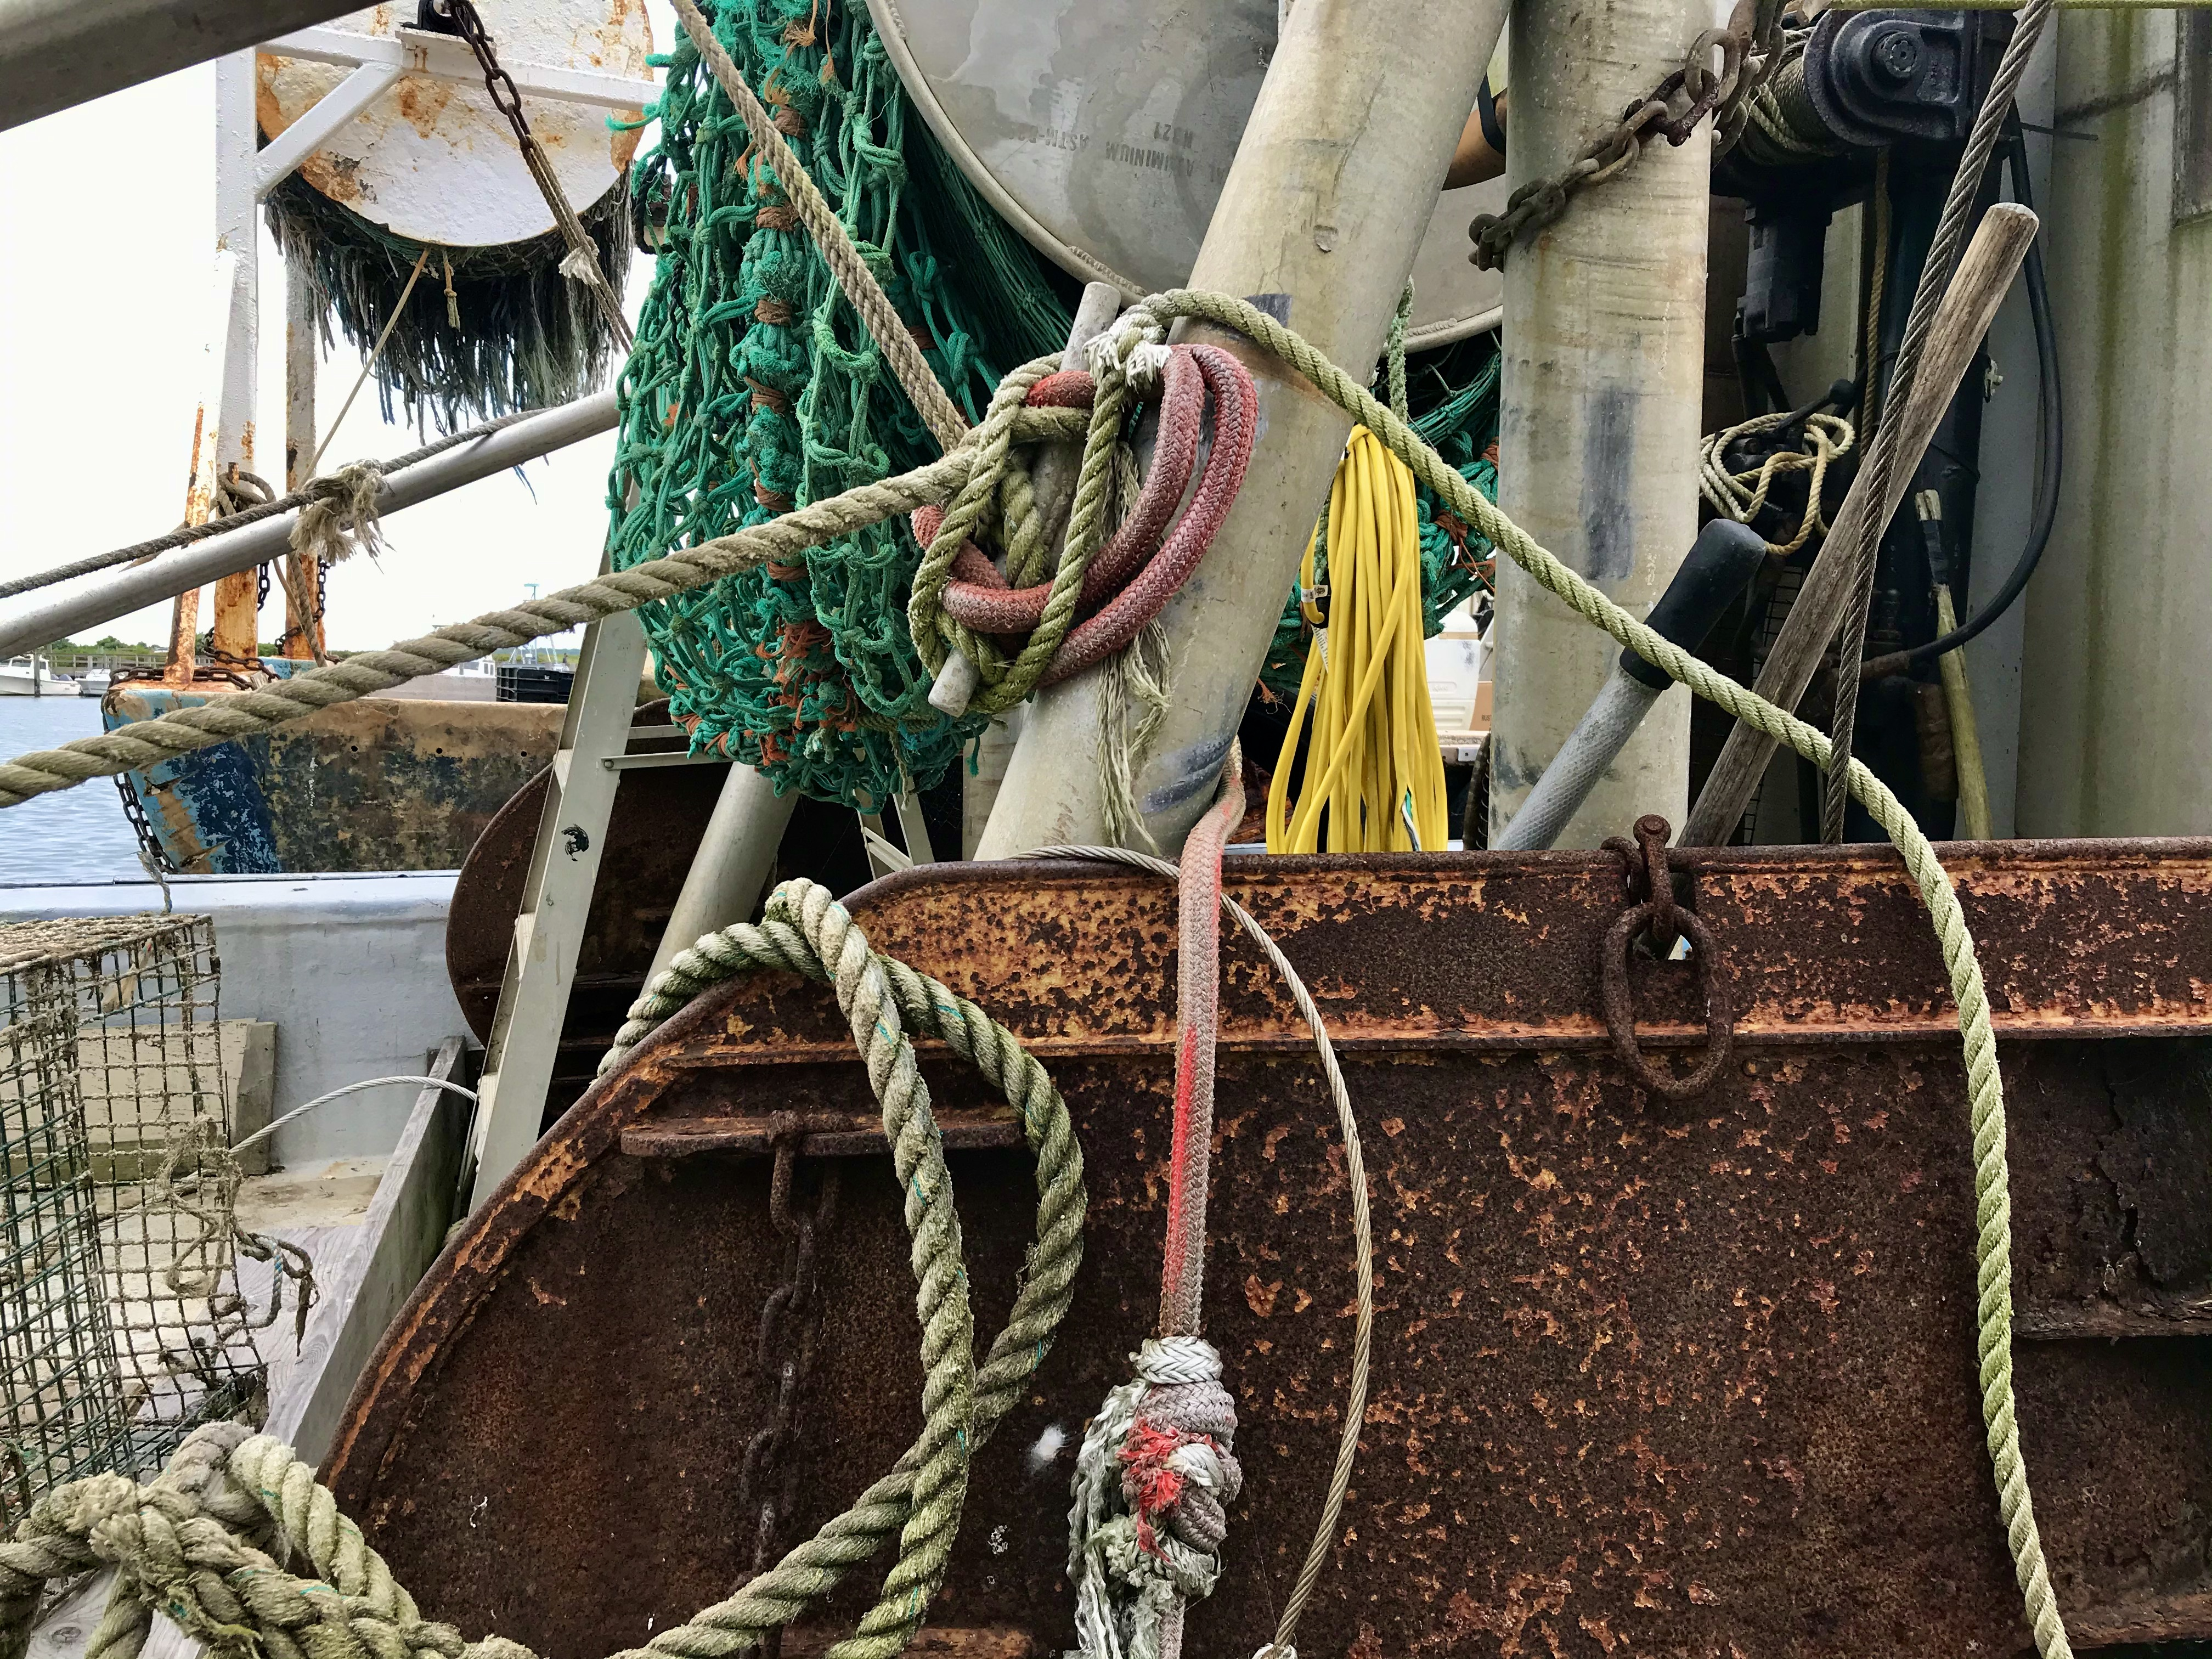 Boatlines